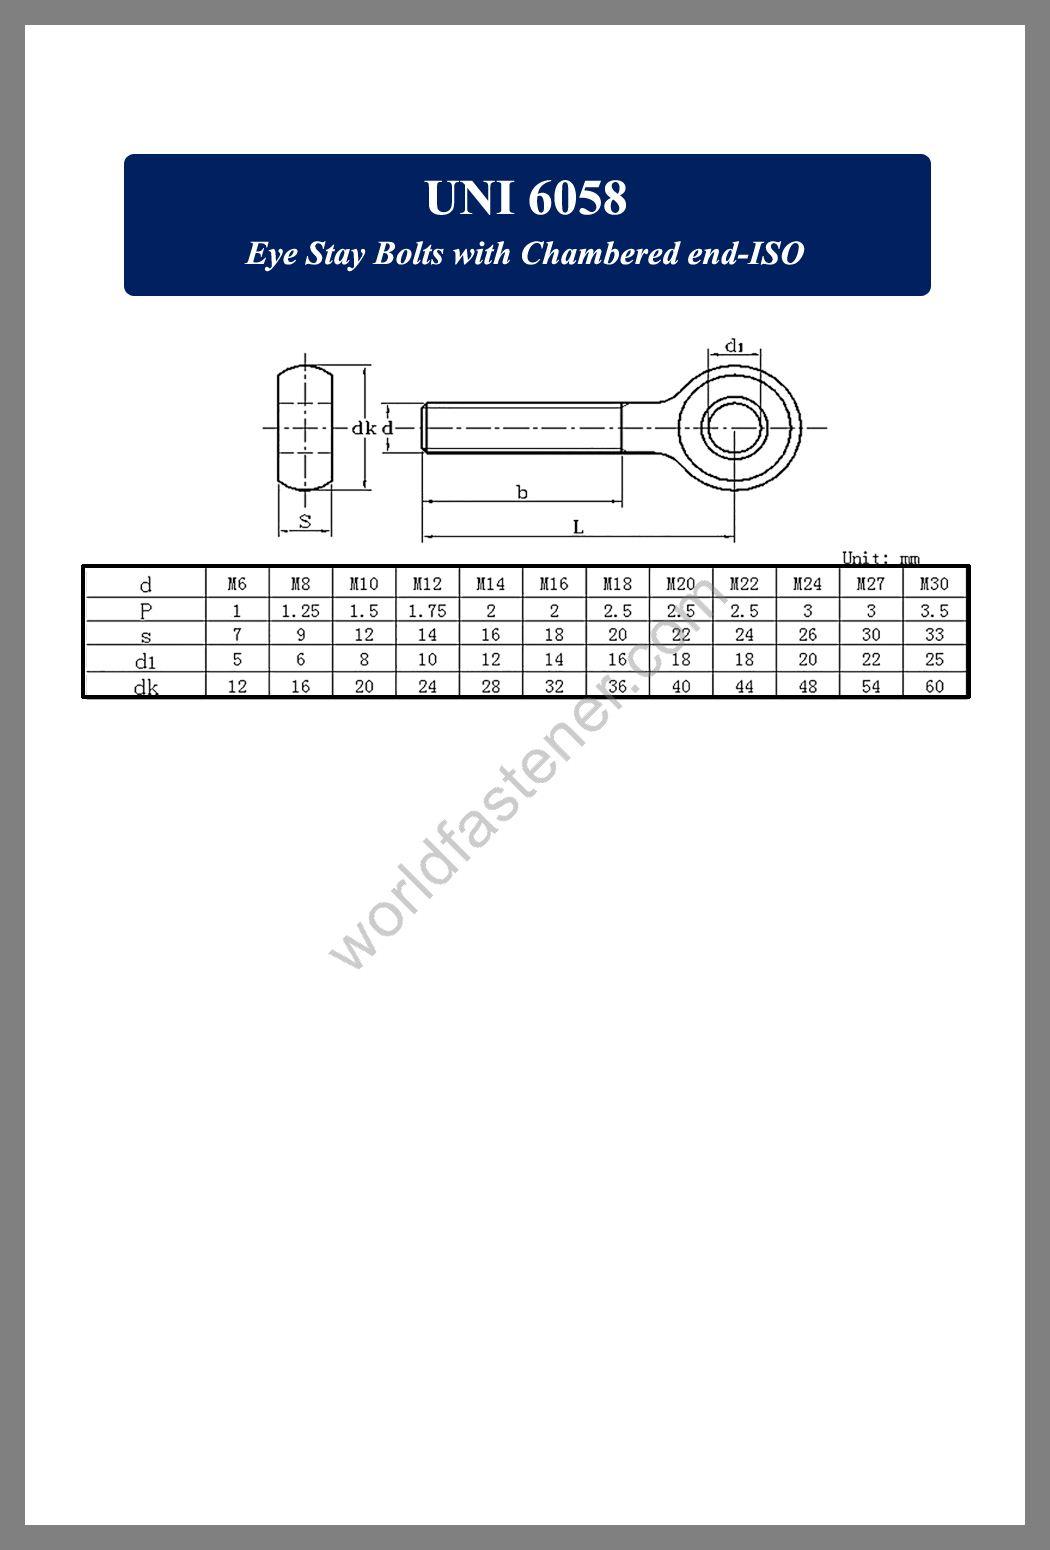 UNI 6058 Eye Stay Bolts with Chamfered End ISO, Eye Bolts, fastener, screw, bolt, UNI standard bolts, UNI standard screws